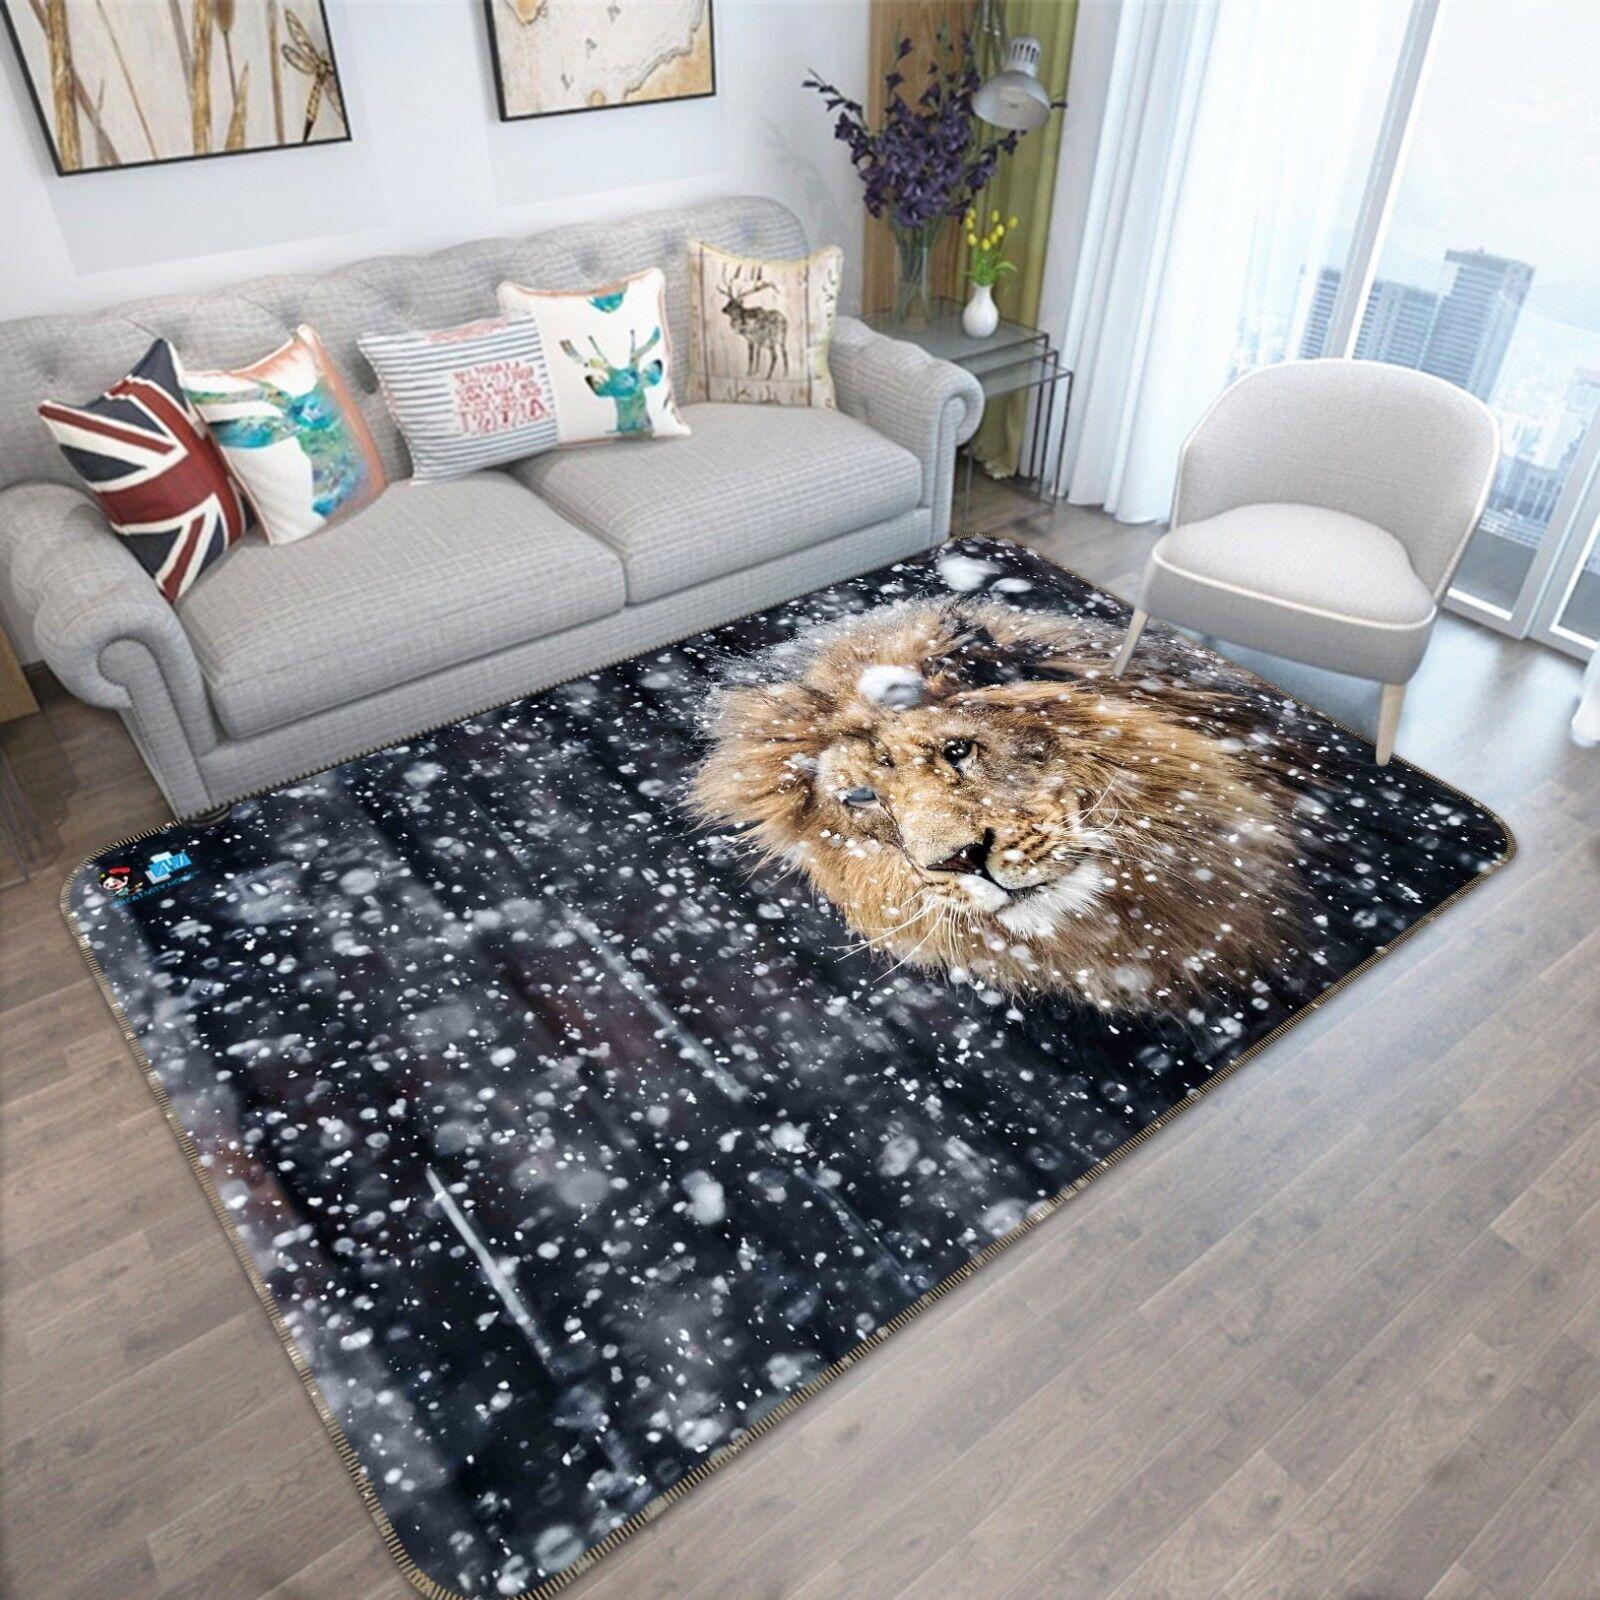 3D Lion Snowflake 44 Non Non Non Slip Rug Mat Room Mat Quality Elegant Photo Carpet UK 14c97d